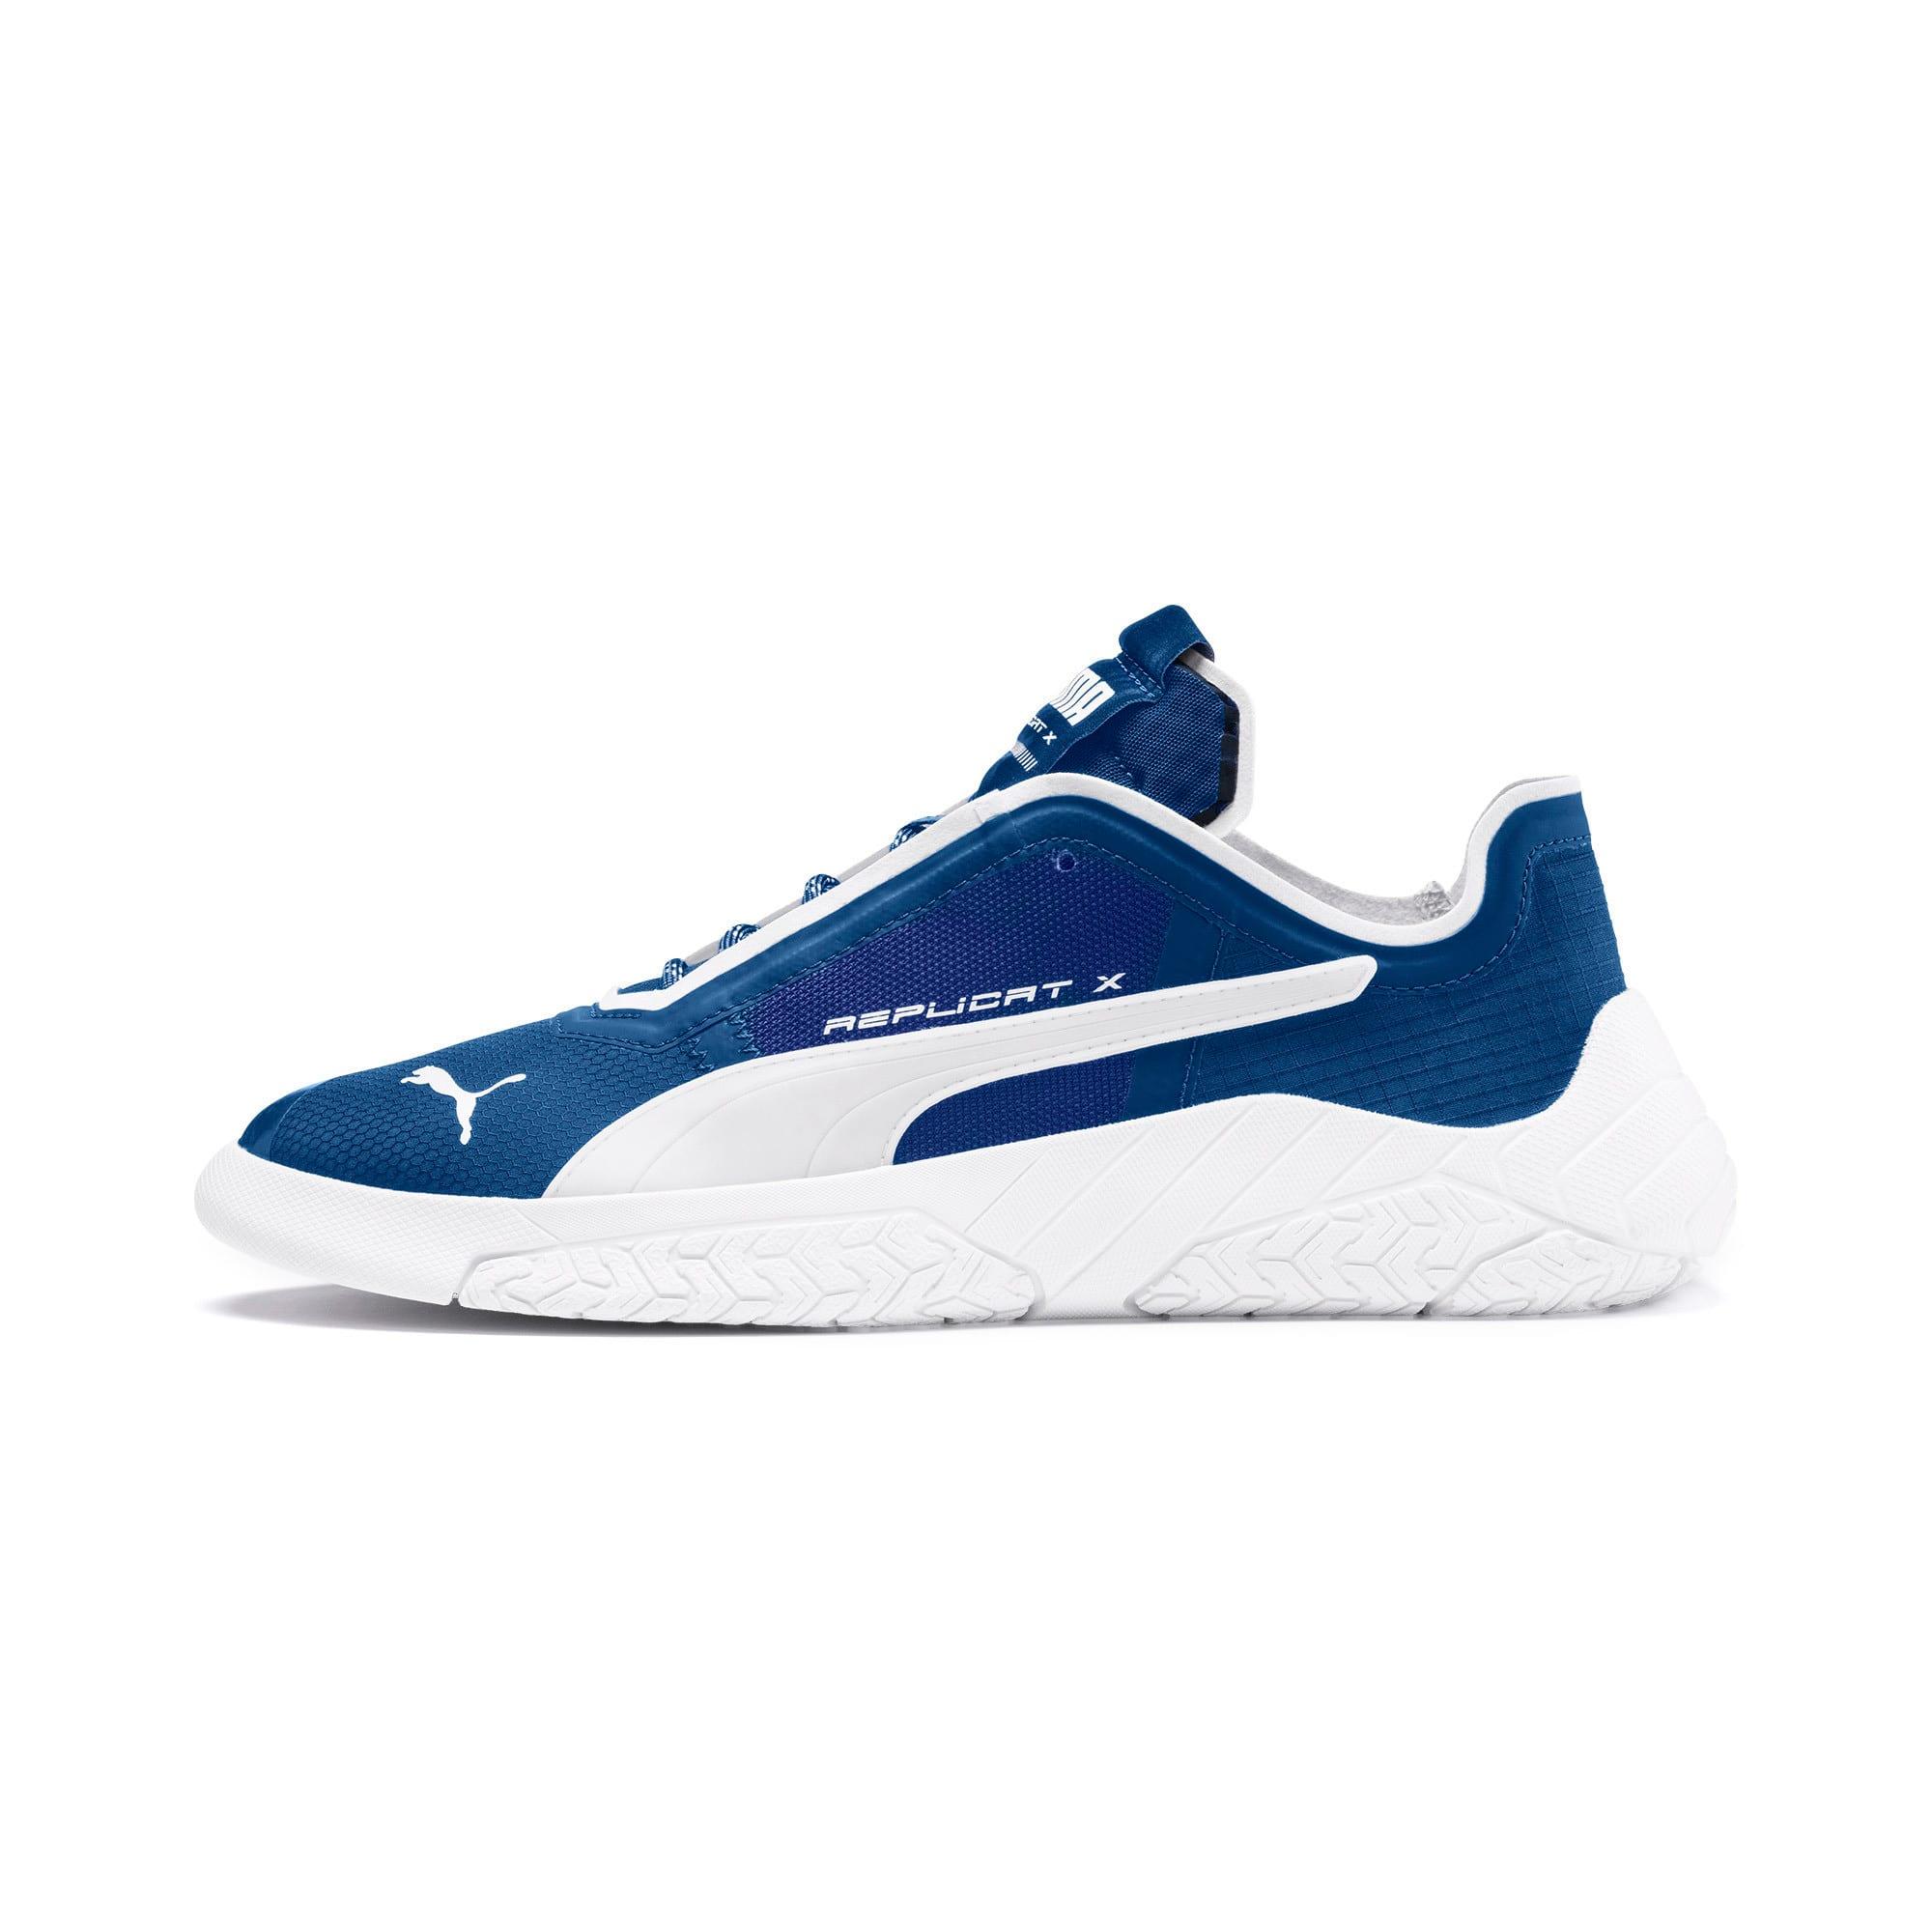 Thumbnail 1 of Replicat-X Circuit Motorsport Shoes, Galaxy Blue-Puma White, medium